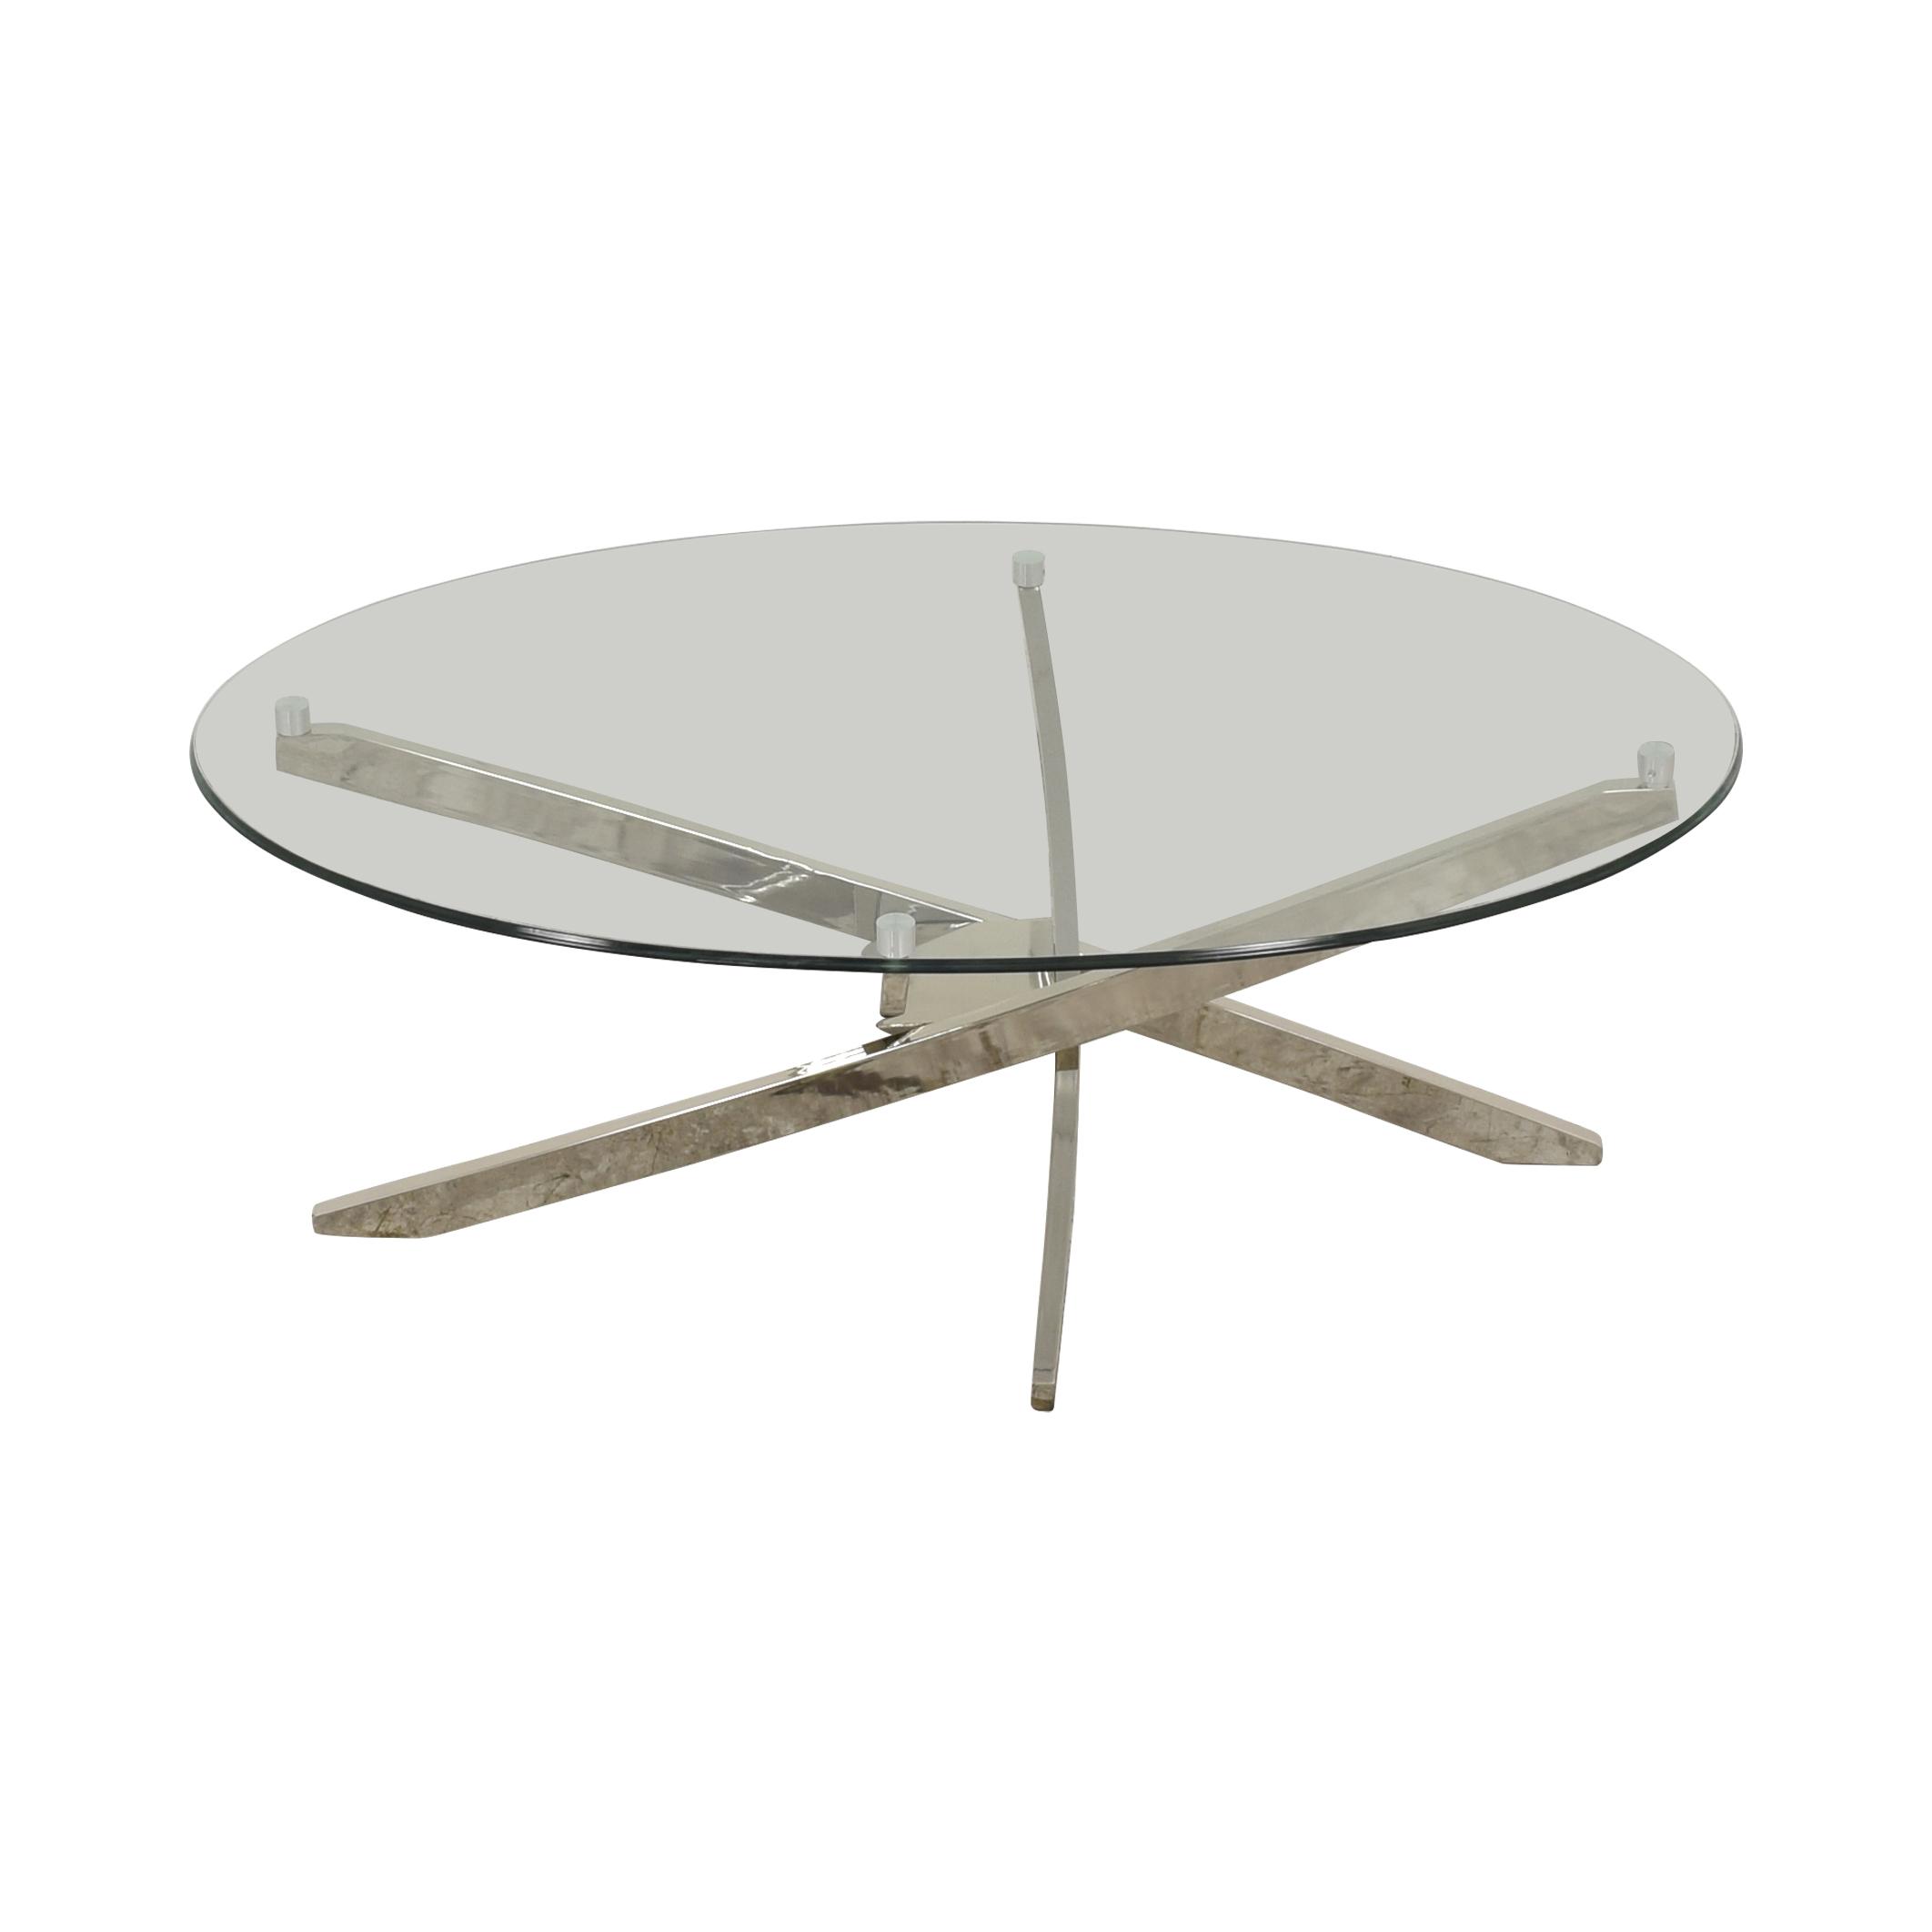 Magnussen Home Magnussen Zila Oval Coffee Table discount